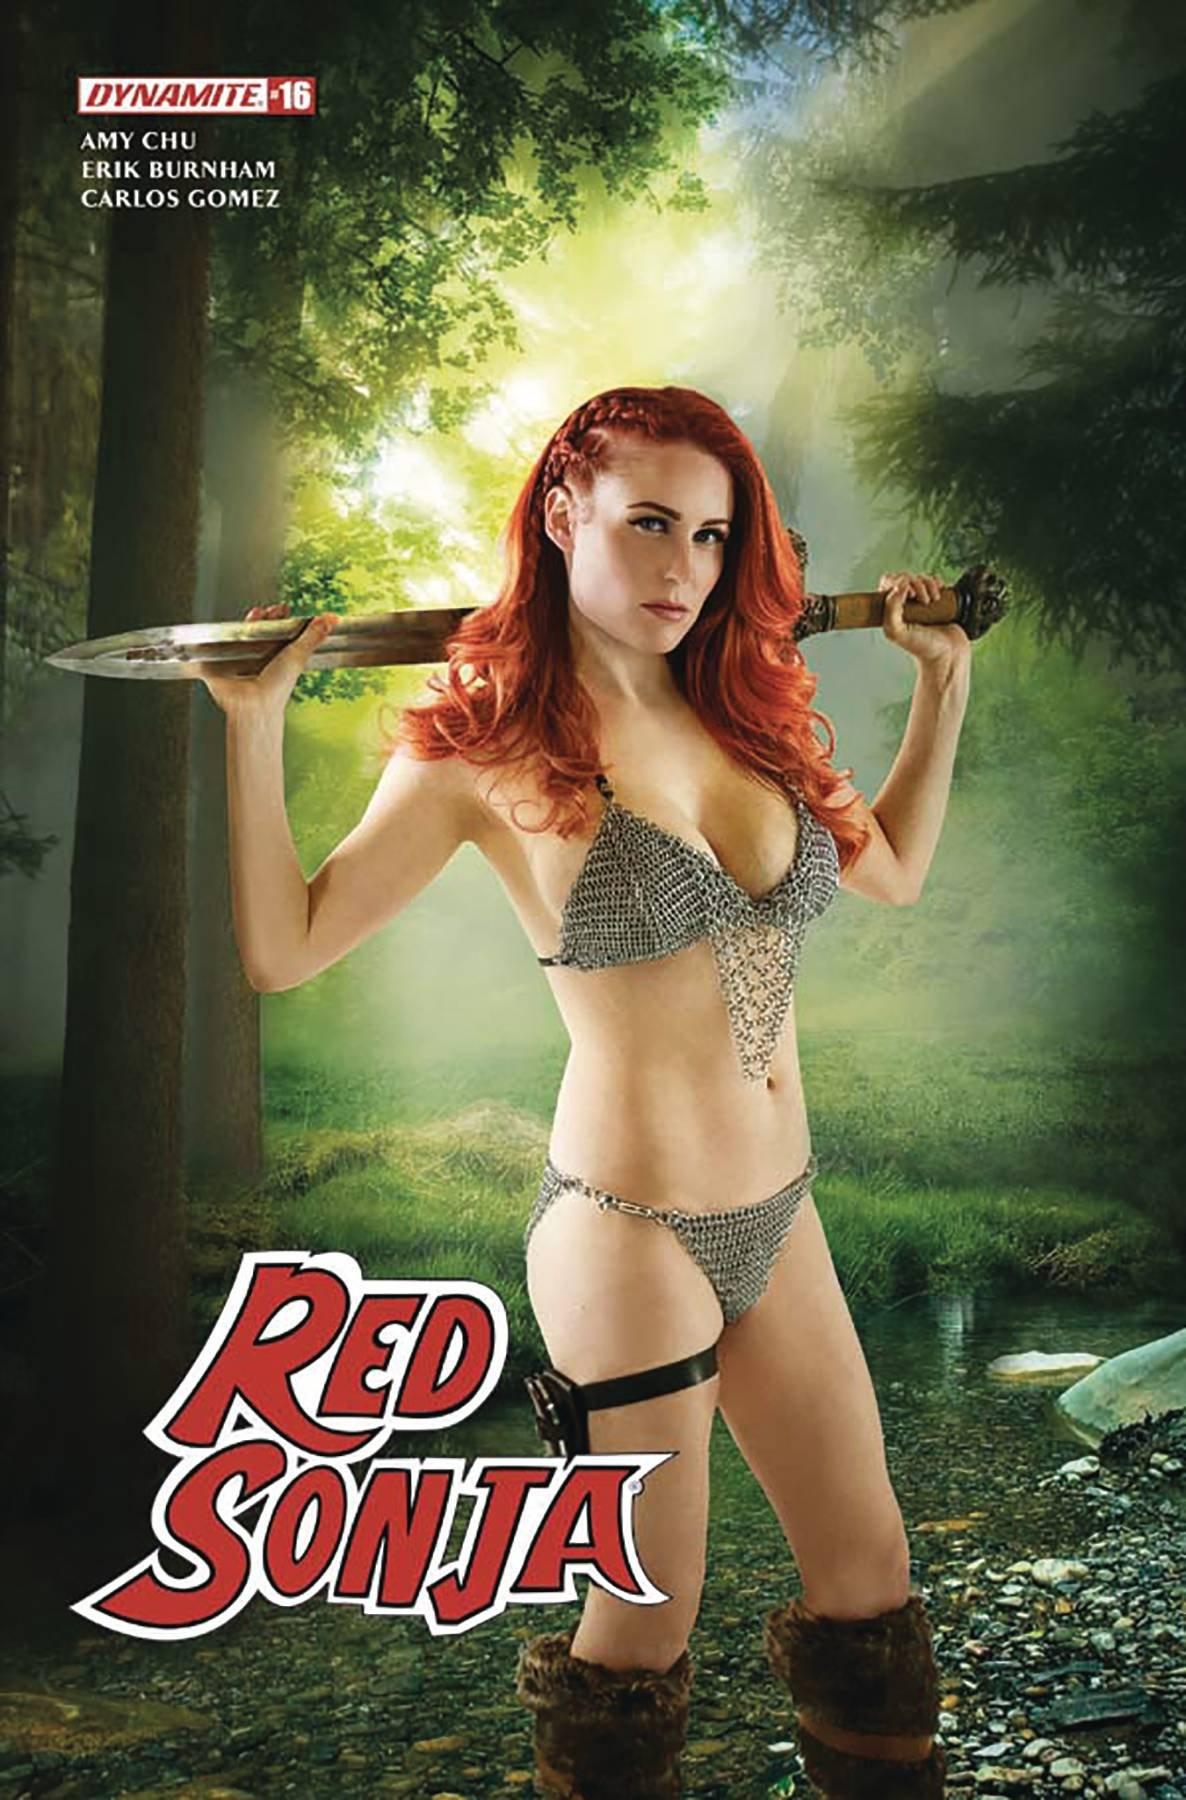 Download RED SONJA #16 CVR D COSPLAY ebook